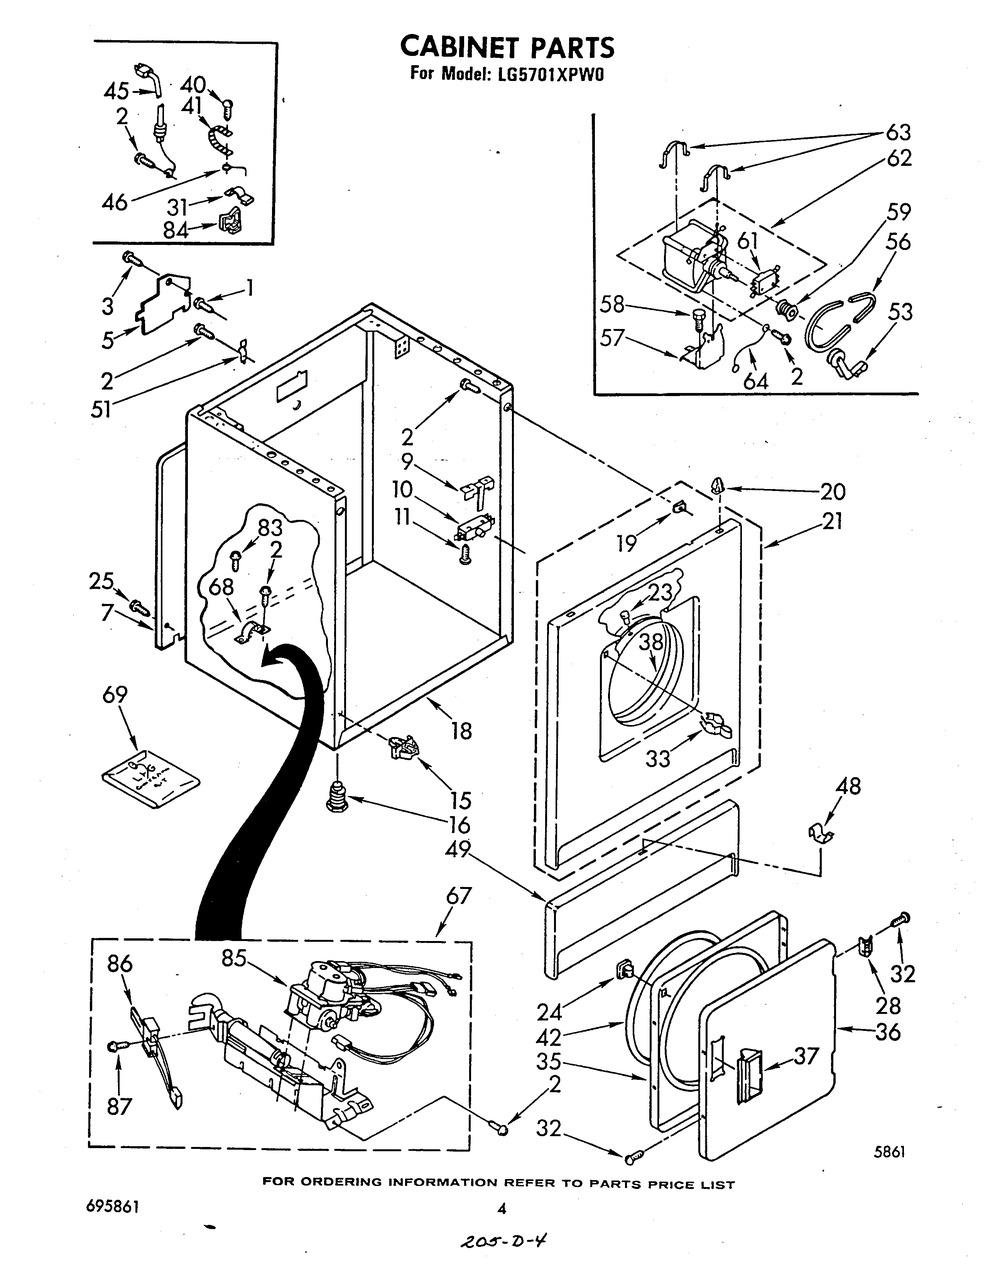 Diagram for LG5701XPW0